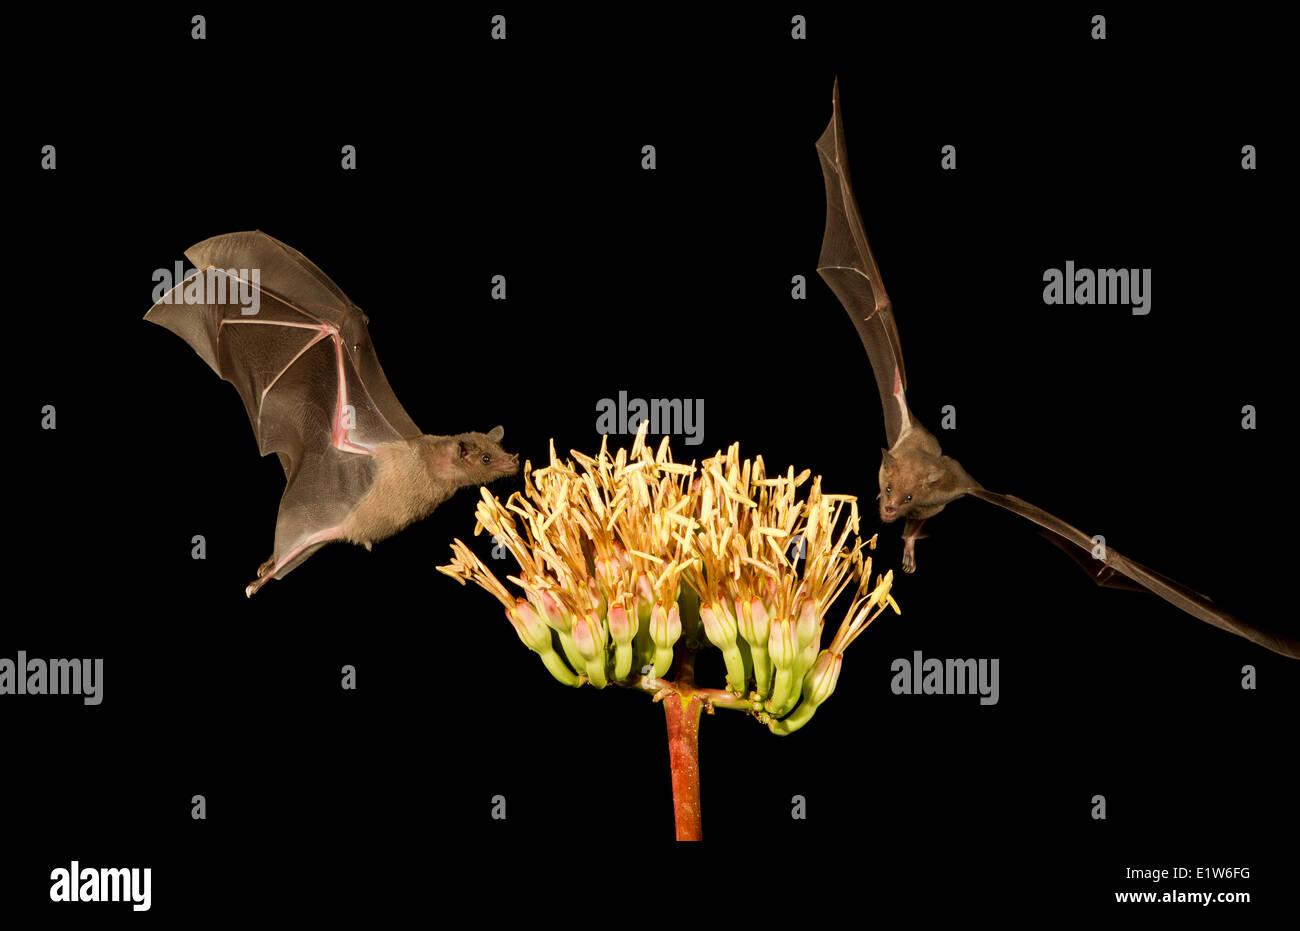 Lesser long-nosed bat (Leptonycteris yerbabuenae), feeding on Agave flower, Amado, Arizona. This bat is listed as vulnerable. Stock Photo